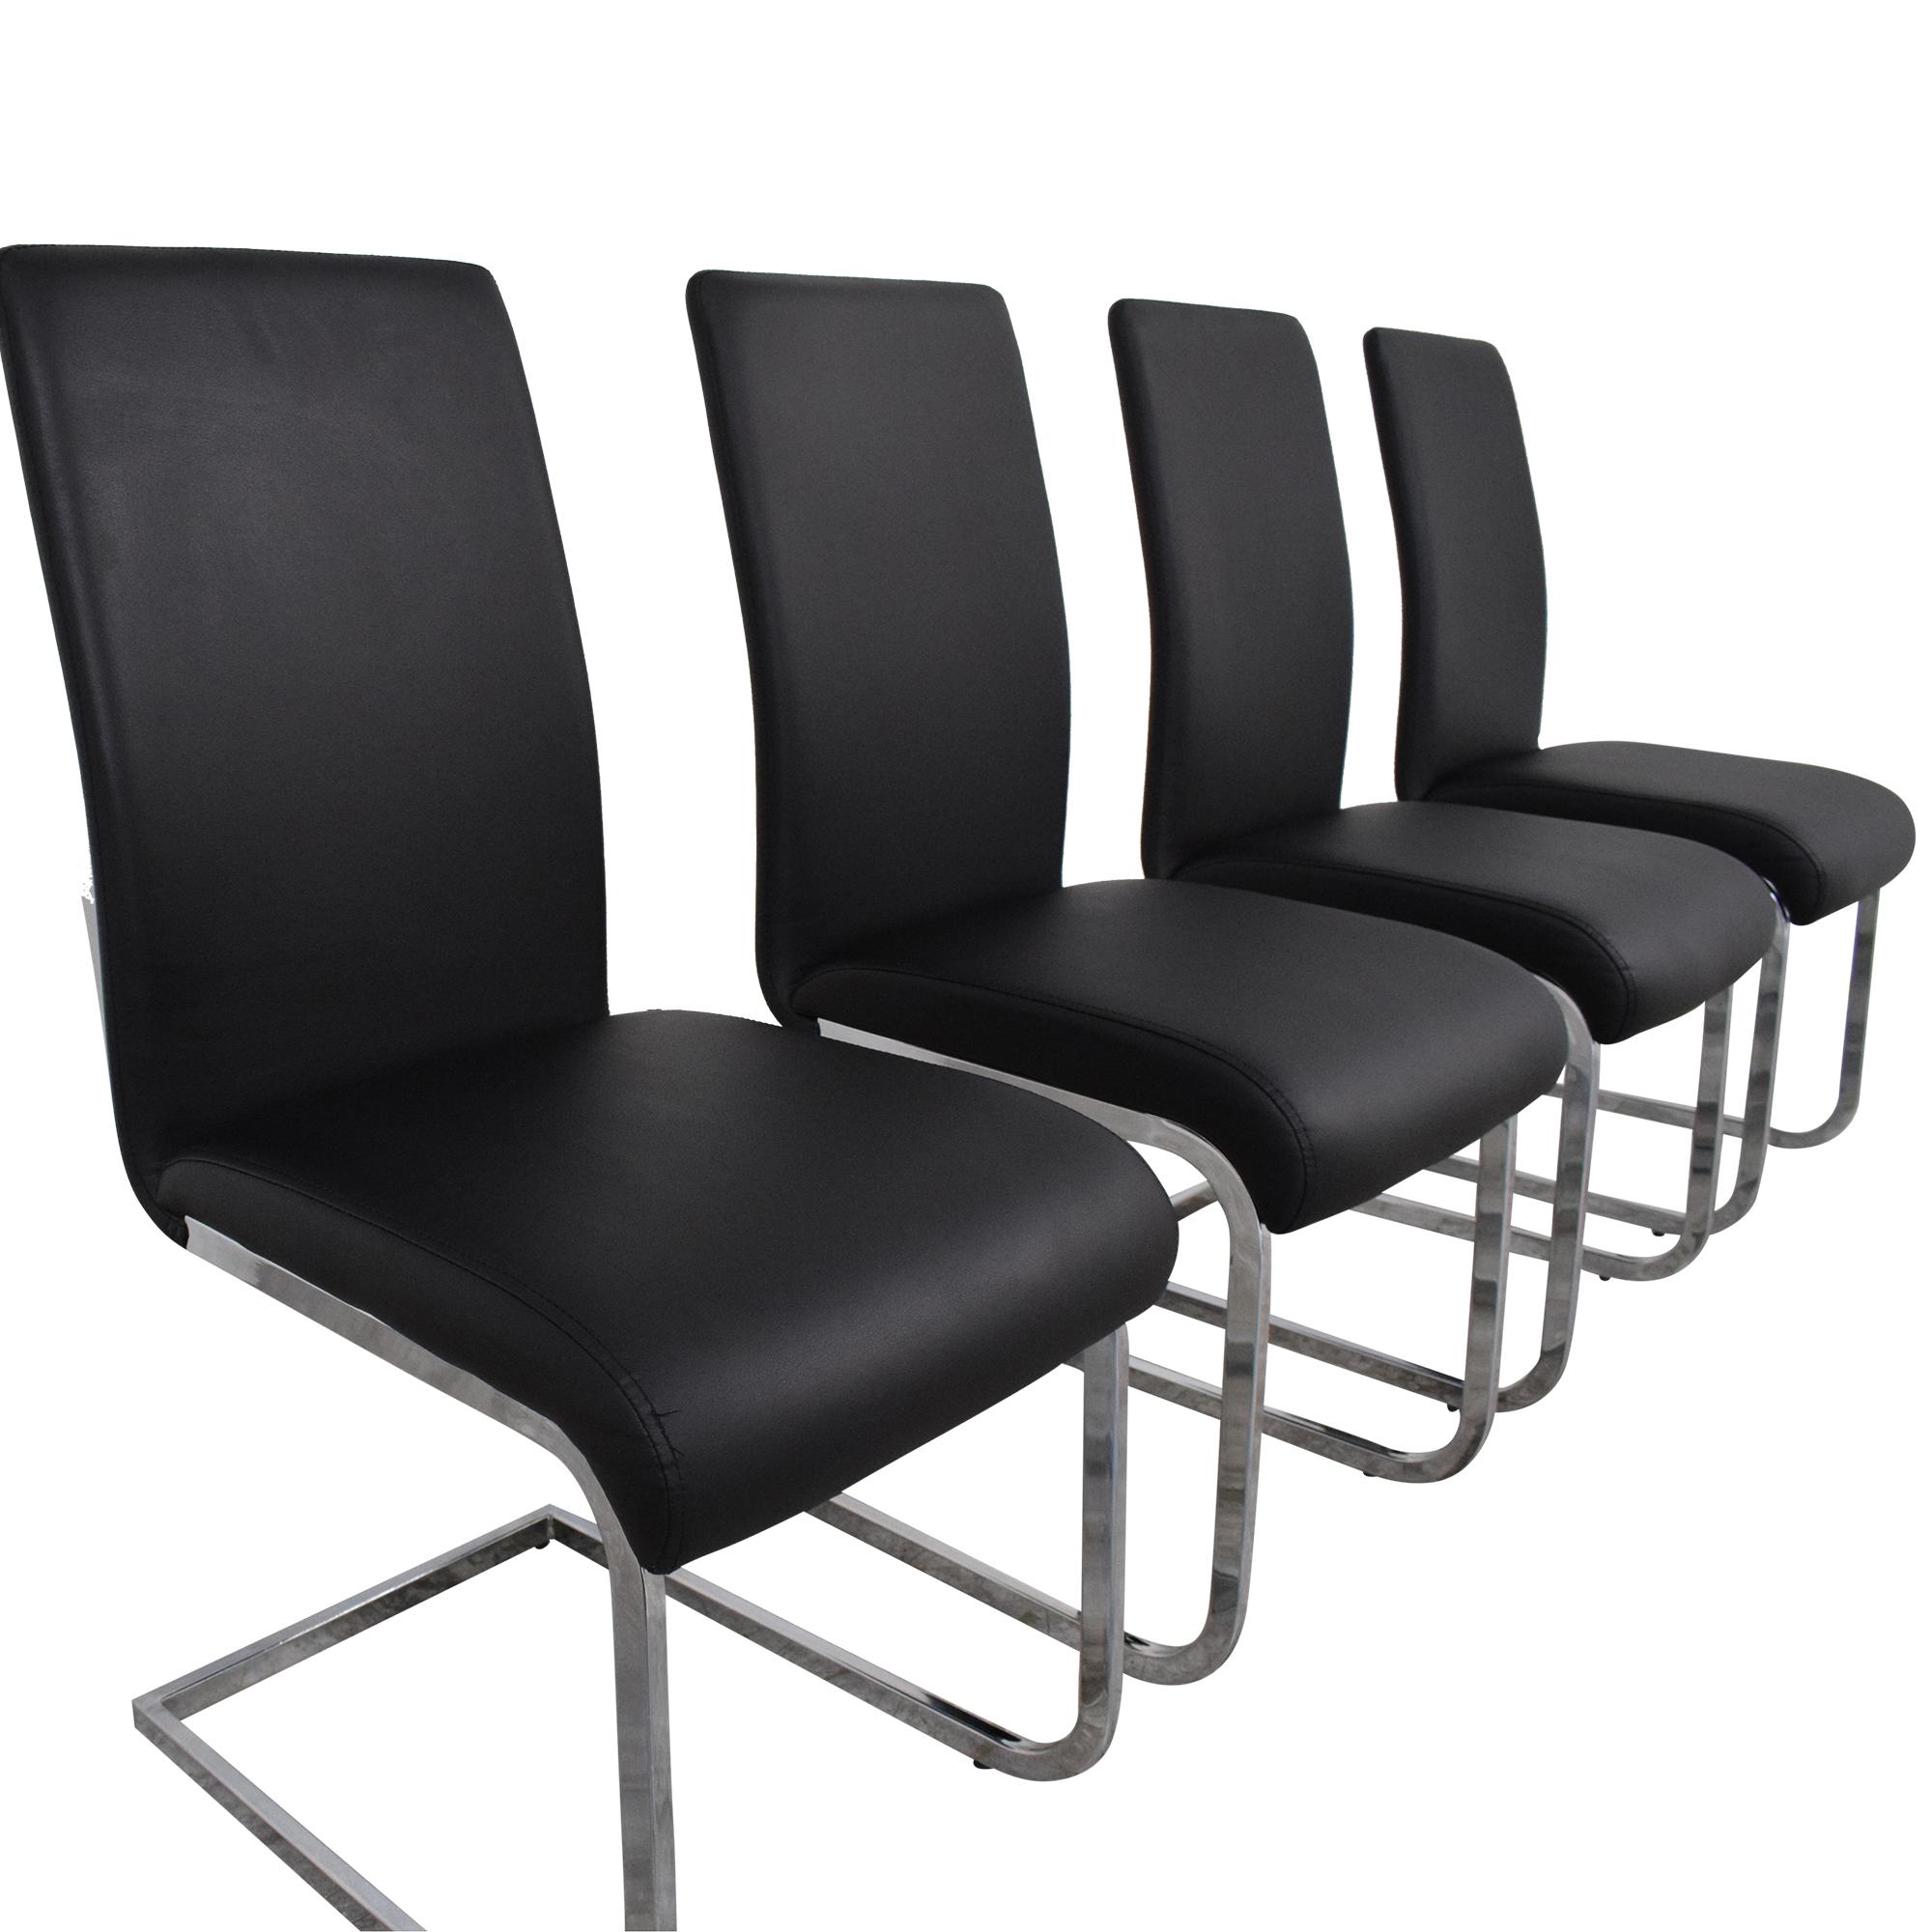 buy CB2 CB2 Silverado Chairs online